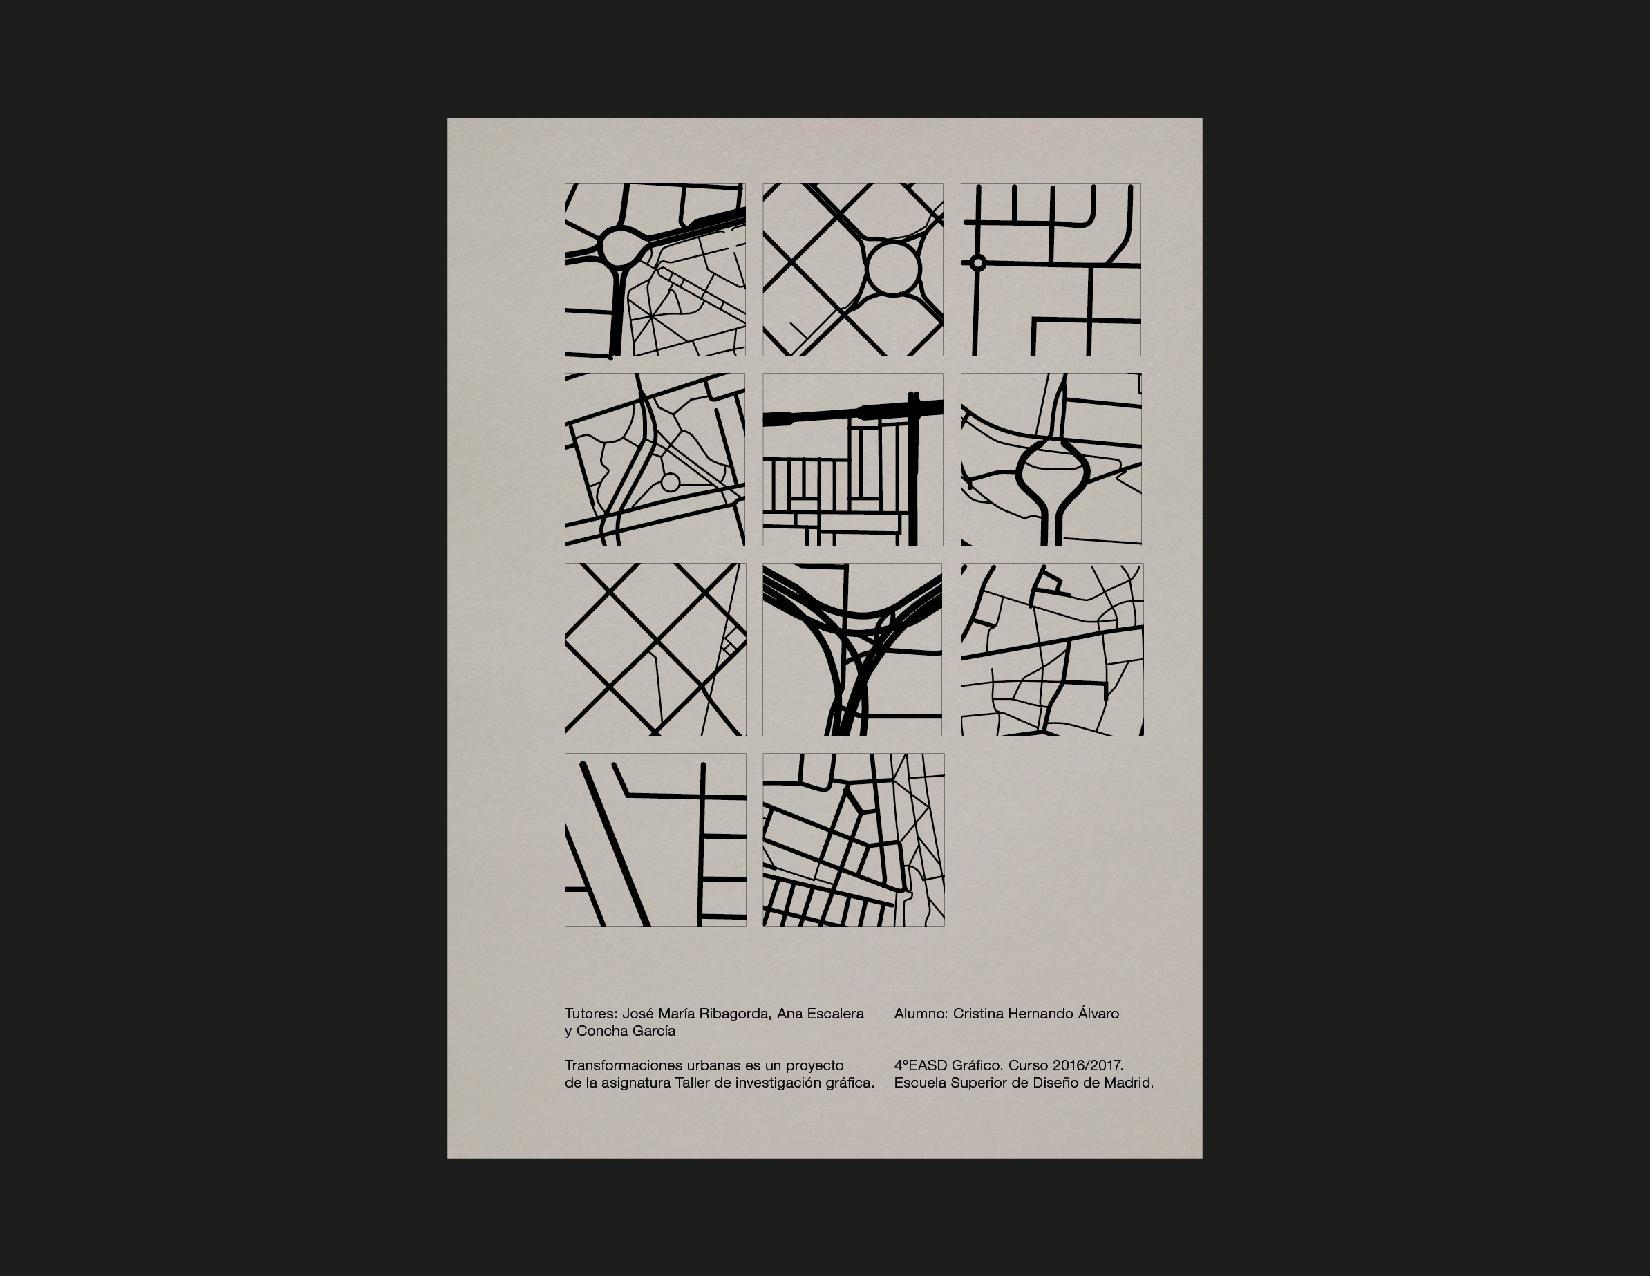 Transformaciones urbanas by Cristina Hernando - Creative Work - $i